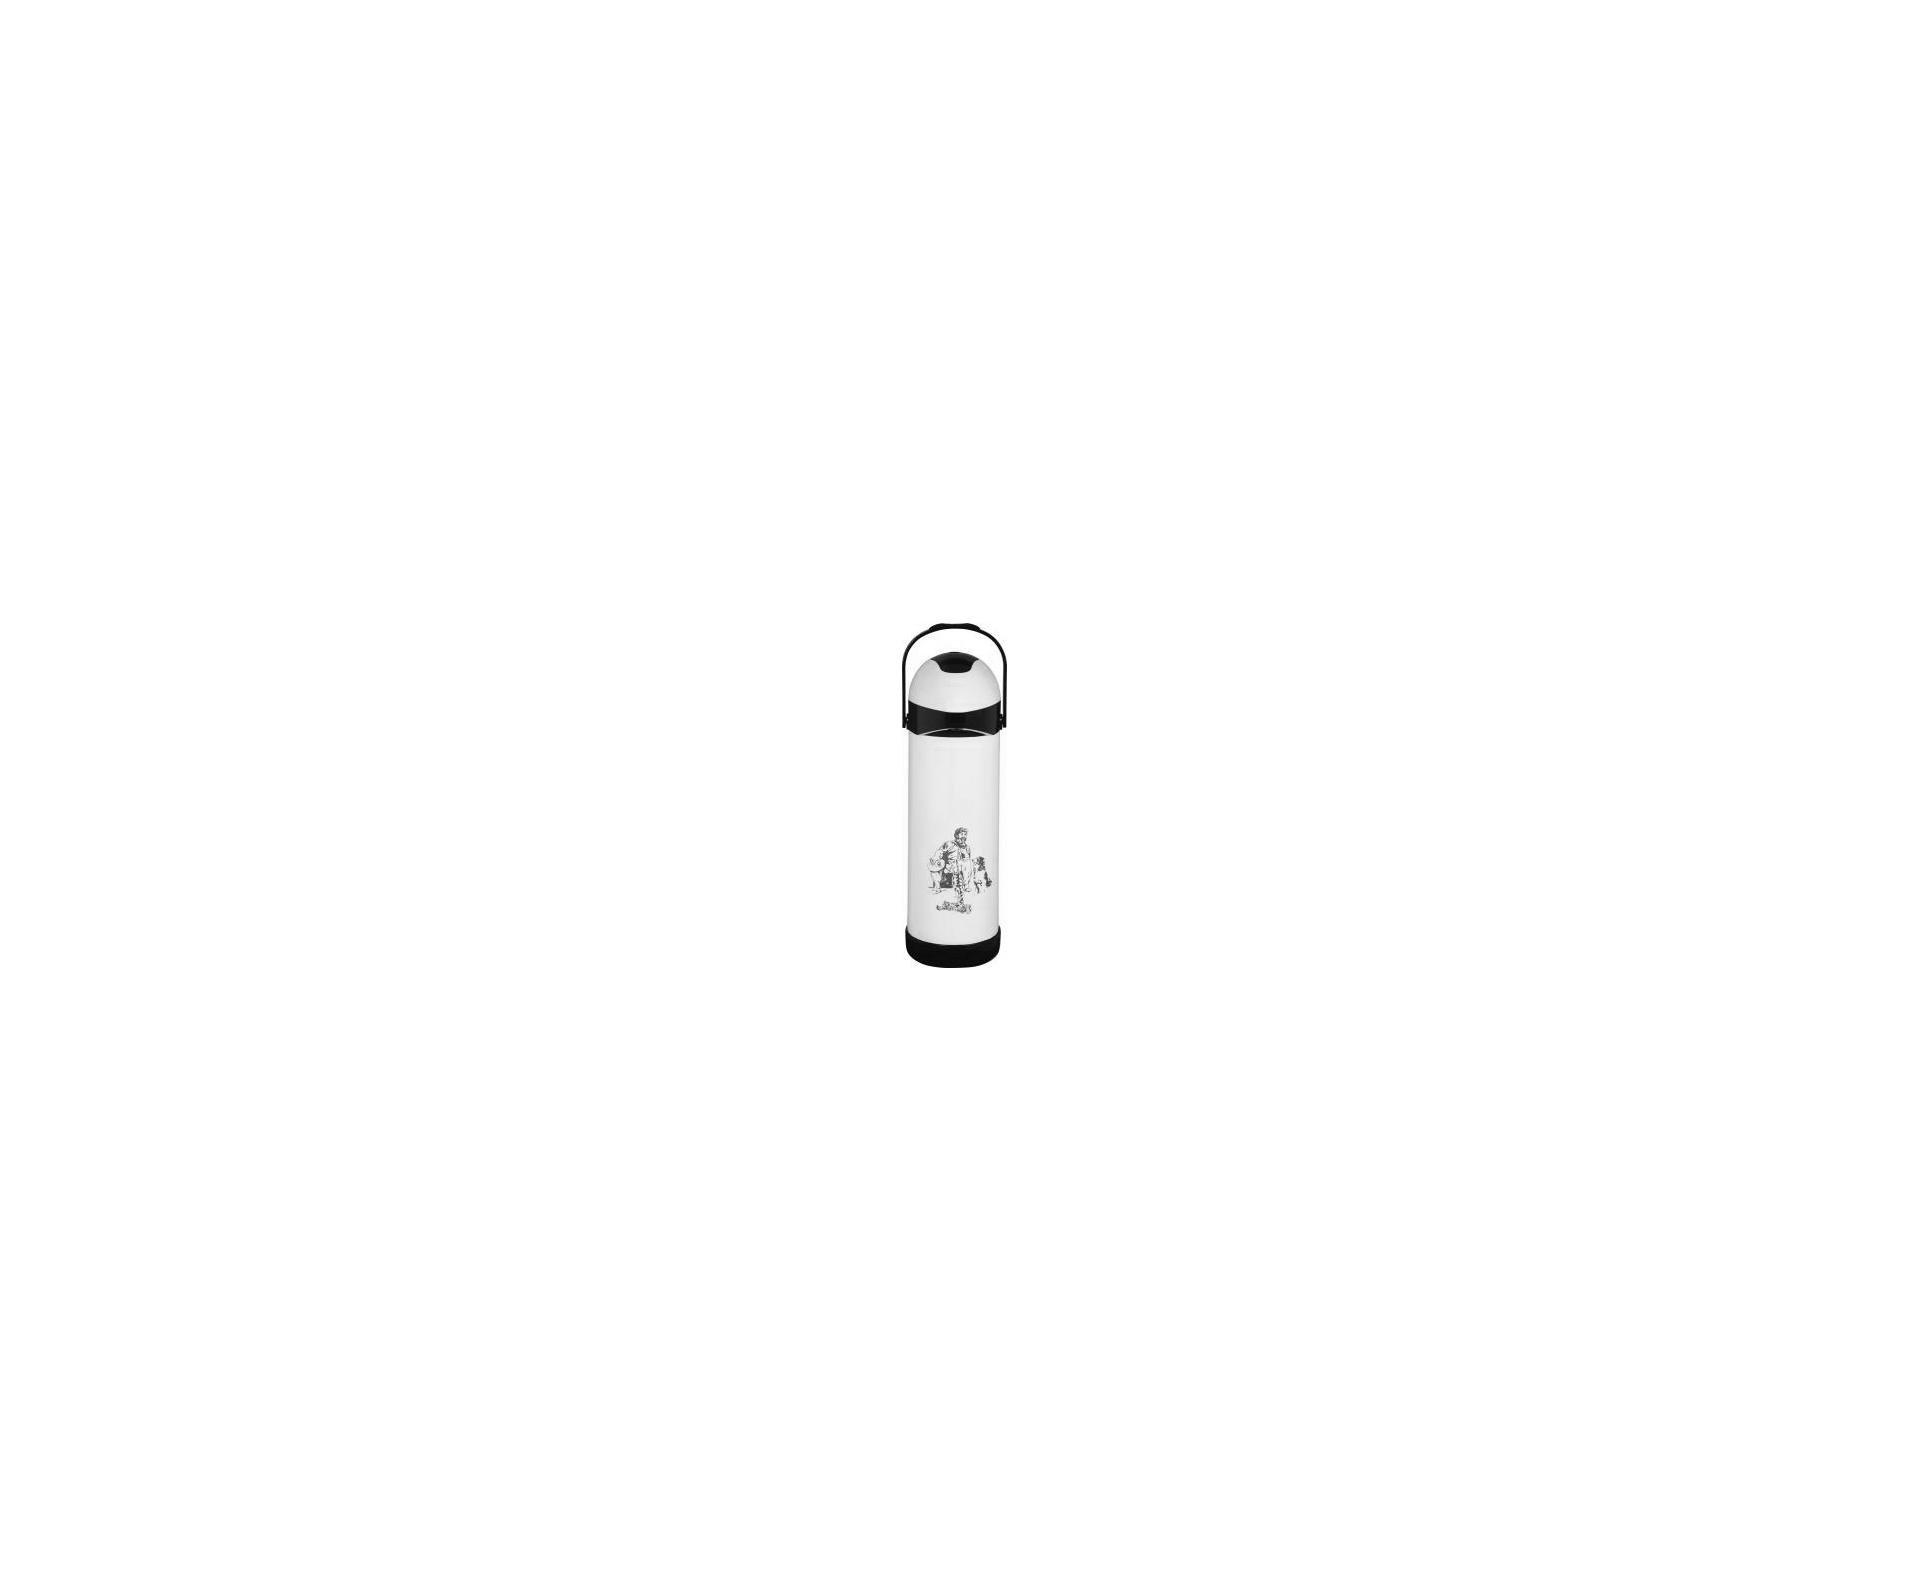 Garrafa Térmica De Pressão Farroupilha 1,0 Litro Branca - Mor